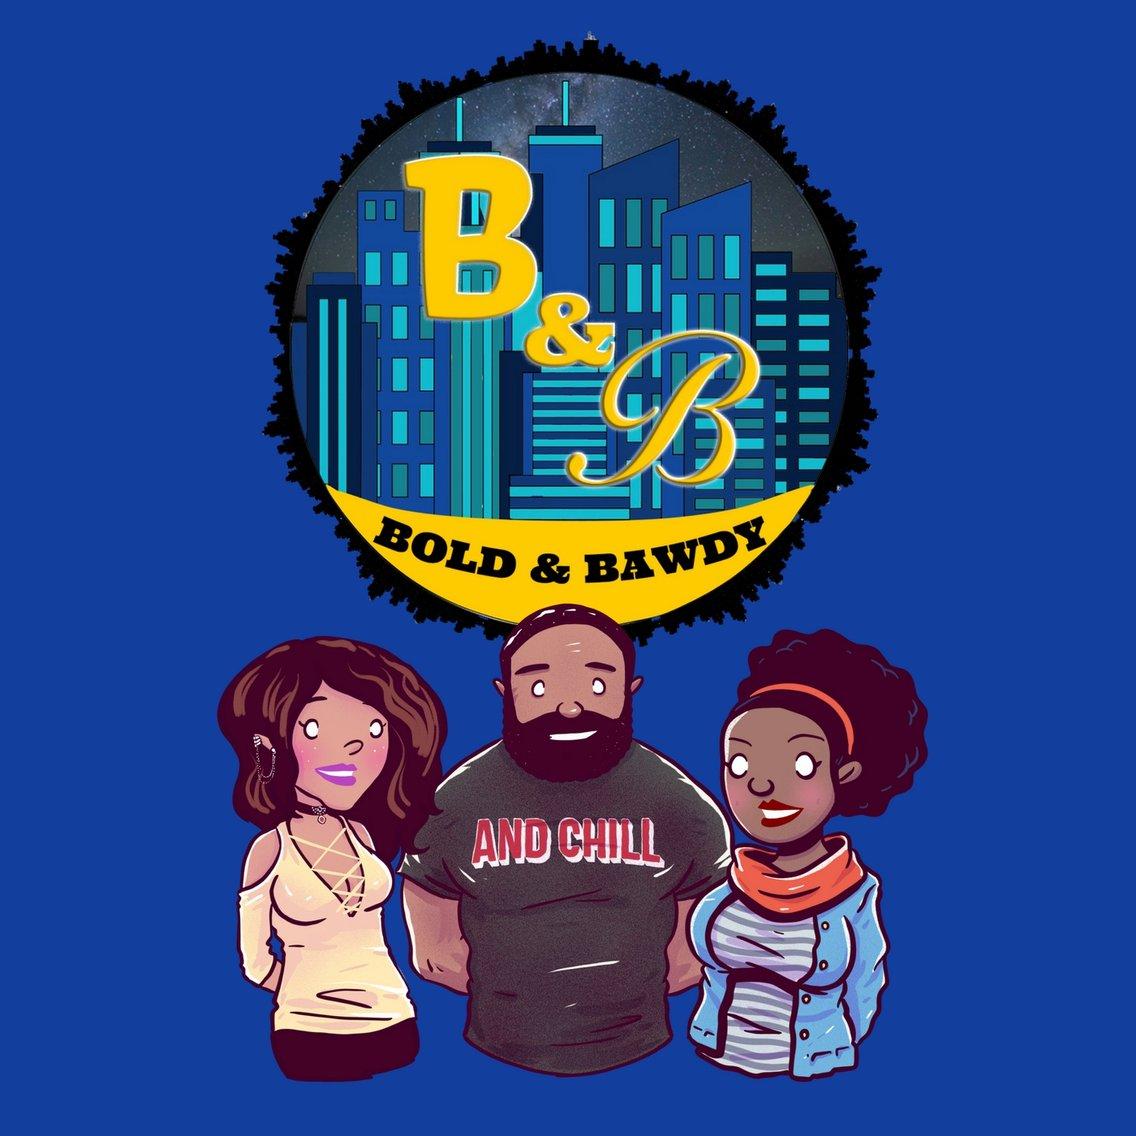 Bold & Bawdy - imagen de portada